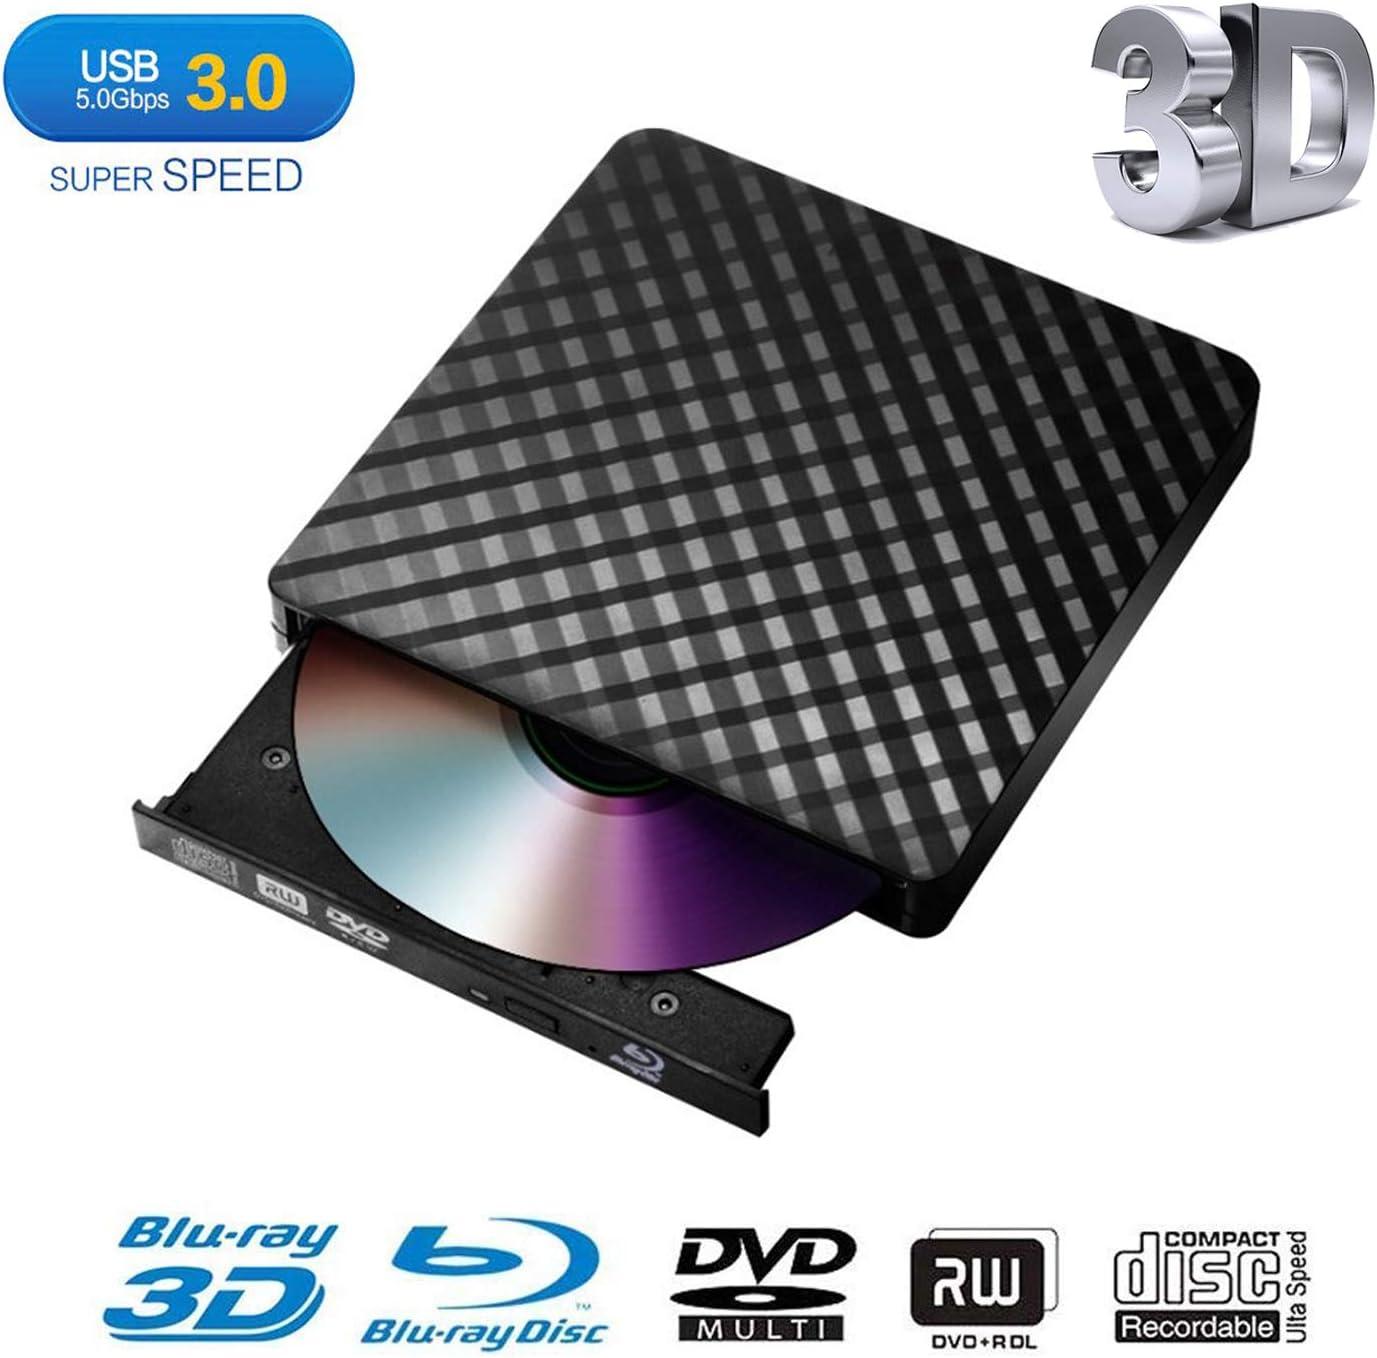 External Blu Ray DVD Drive,Portable Ultra-Thin USB 3.0 External 3D Blu Ray CD DVD BD Burner DVD RW Player Writer Reader Disk for Mac OS Windows XP/7/8/10 MacBook PC iMac Laptop-Black(Xglysmyc)